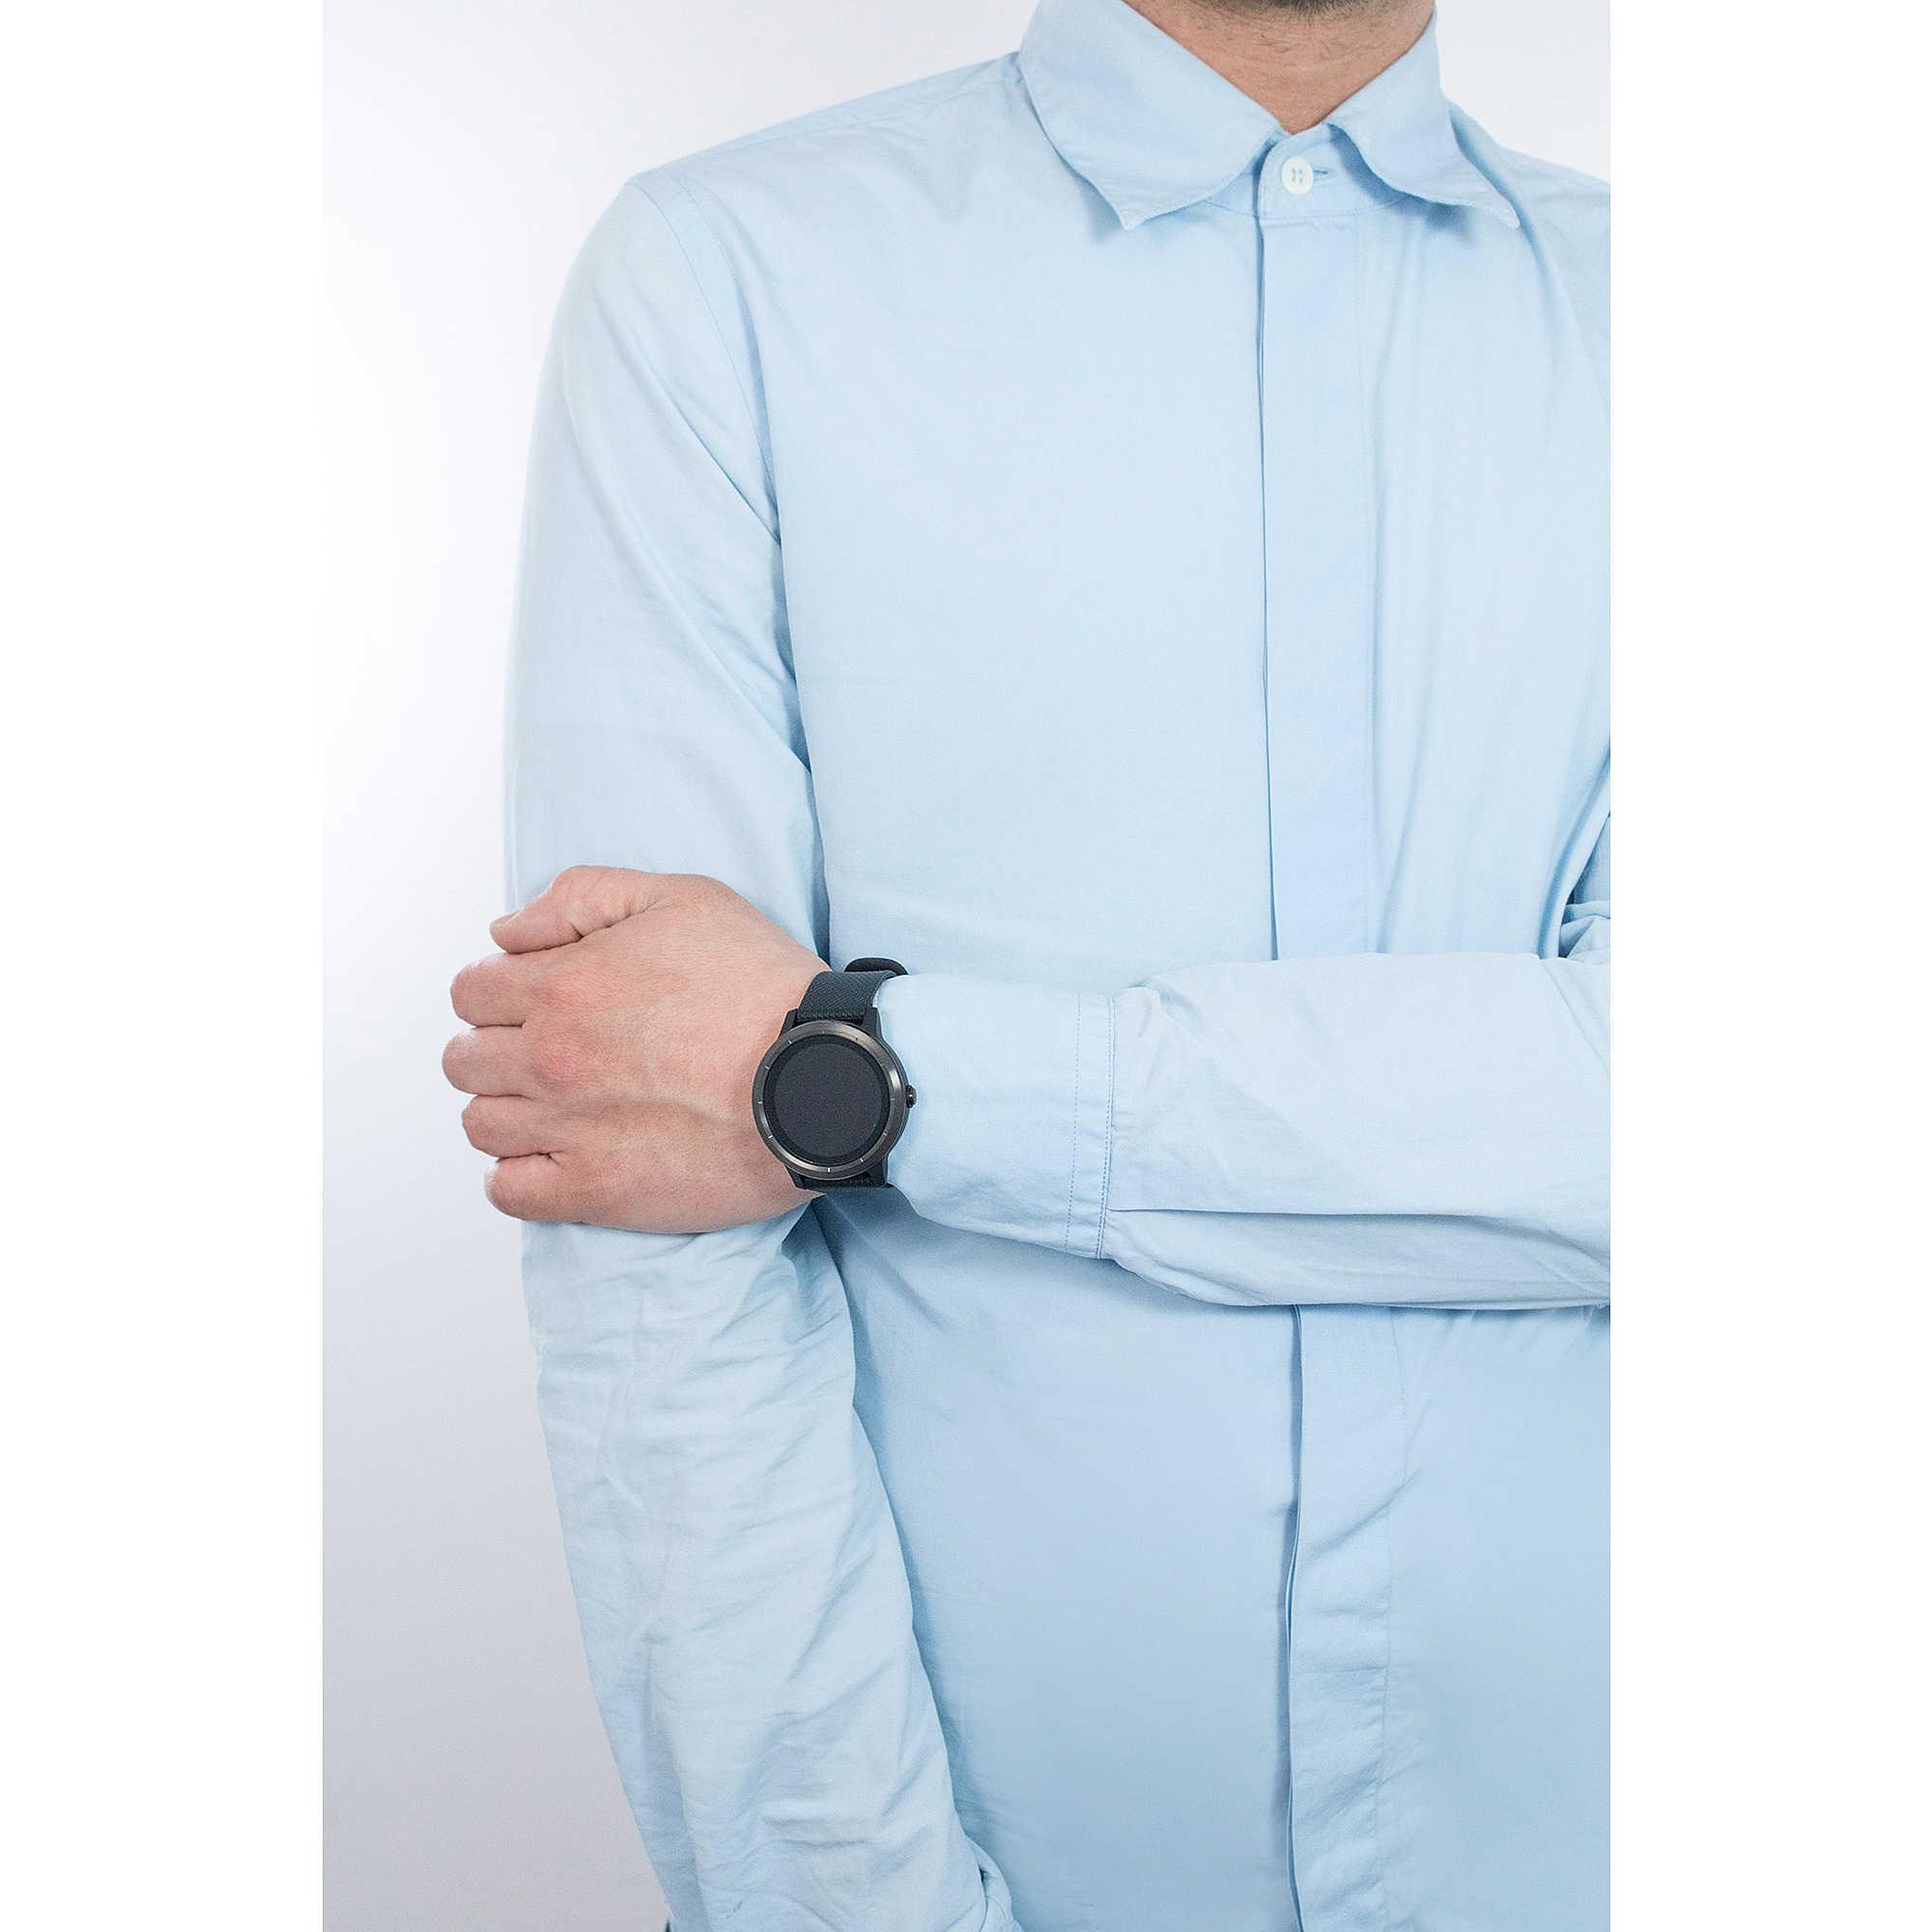 watch Smartwatch man Garmin Vivoactive 3 010-01769-10 Smartwatches ... db247b1a40a